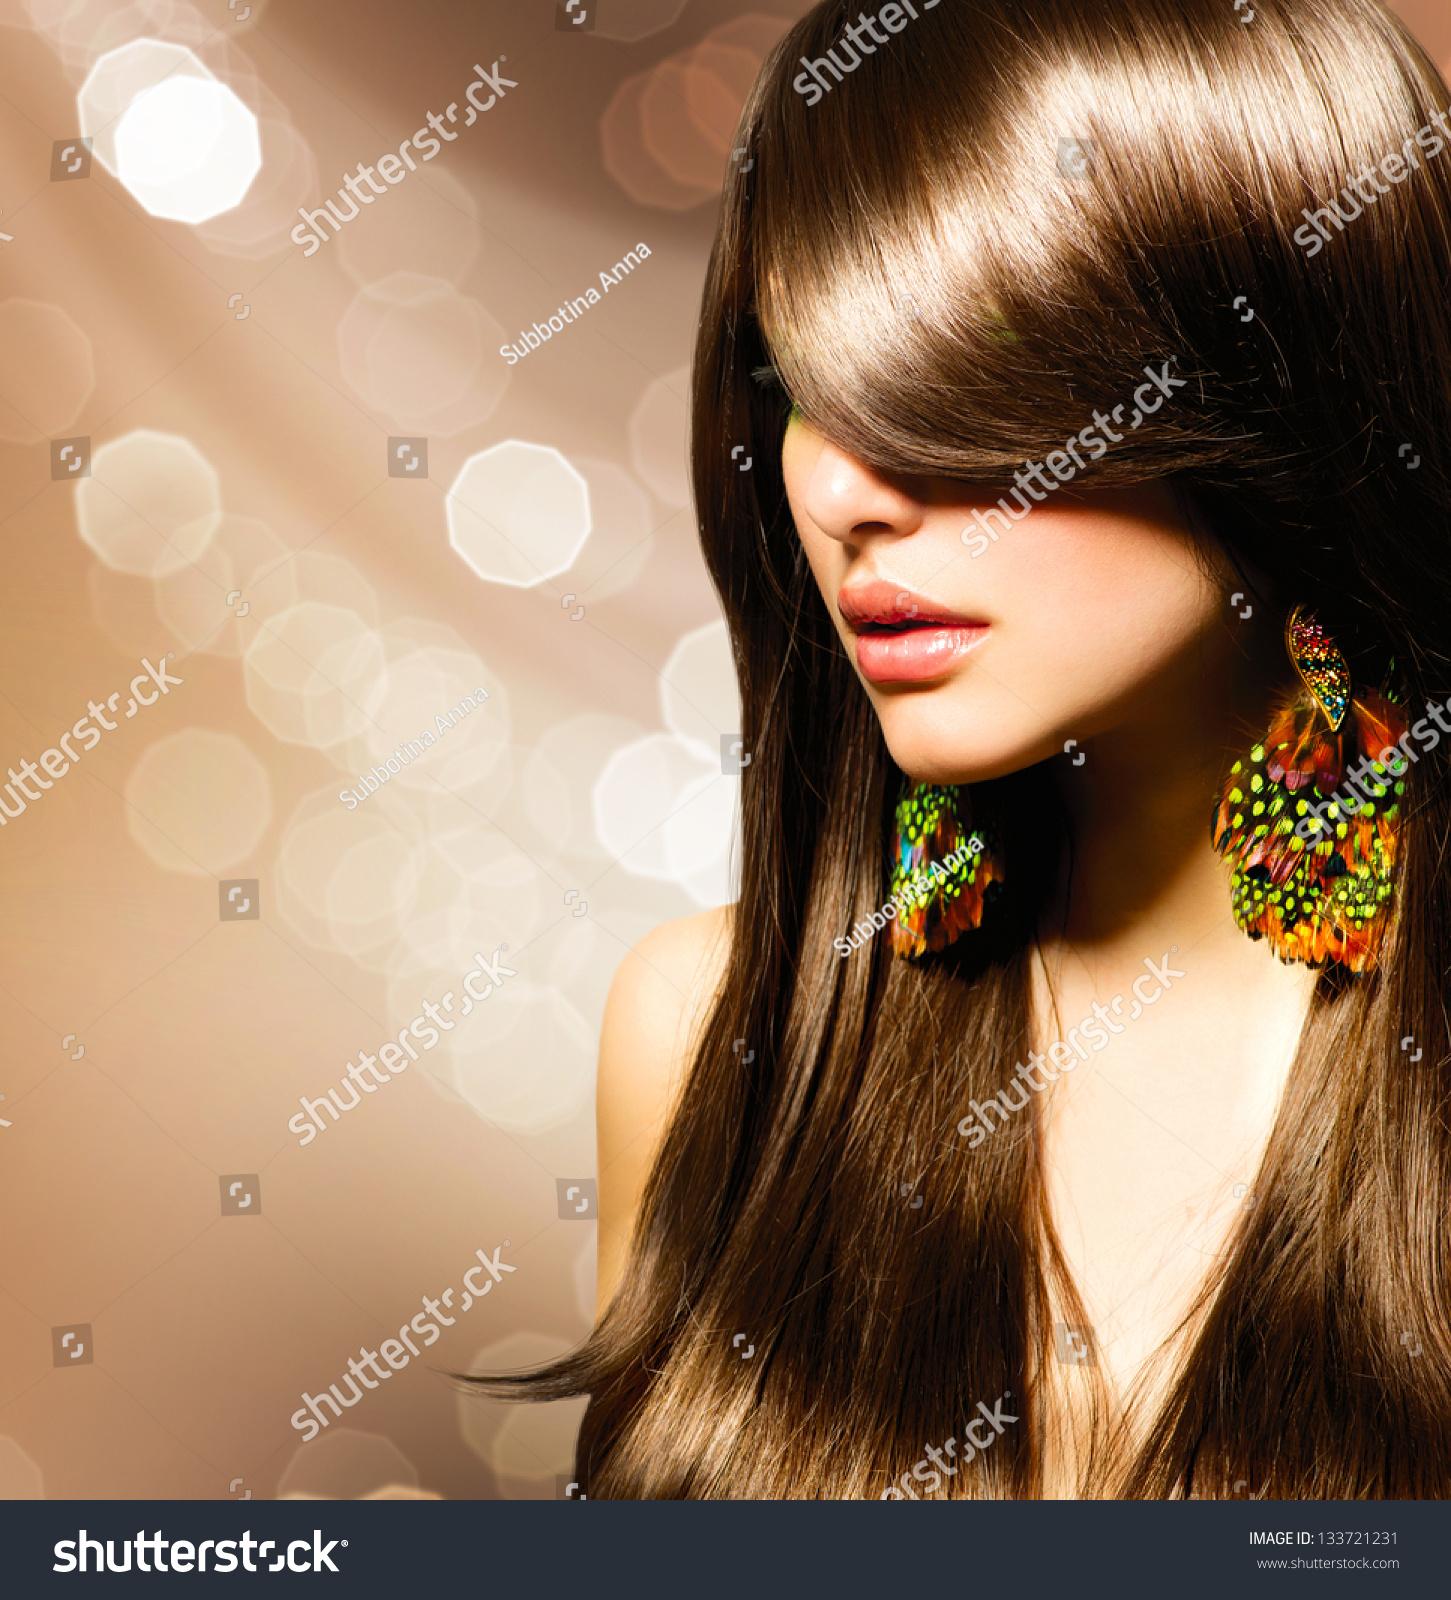 Hair Beautiful Brunette Girl Healthy Long Stock Photo - Haircut girl model